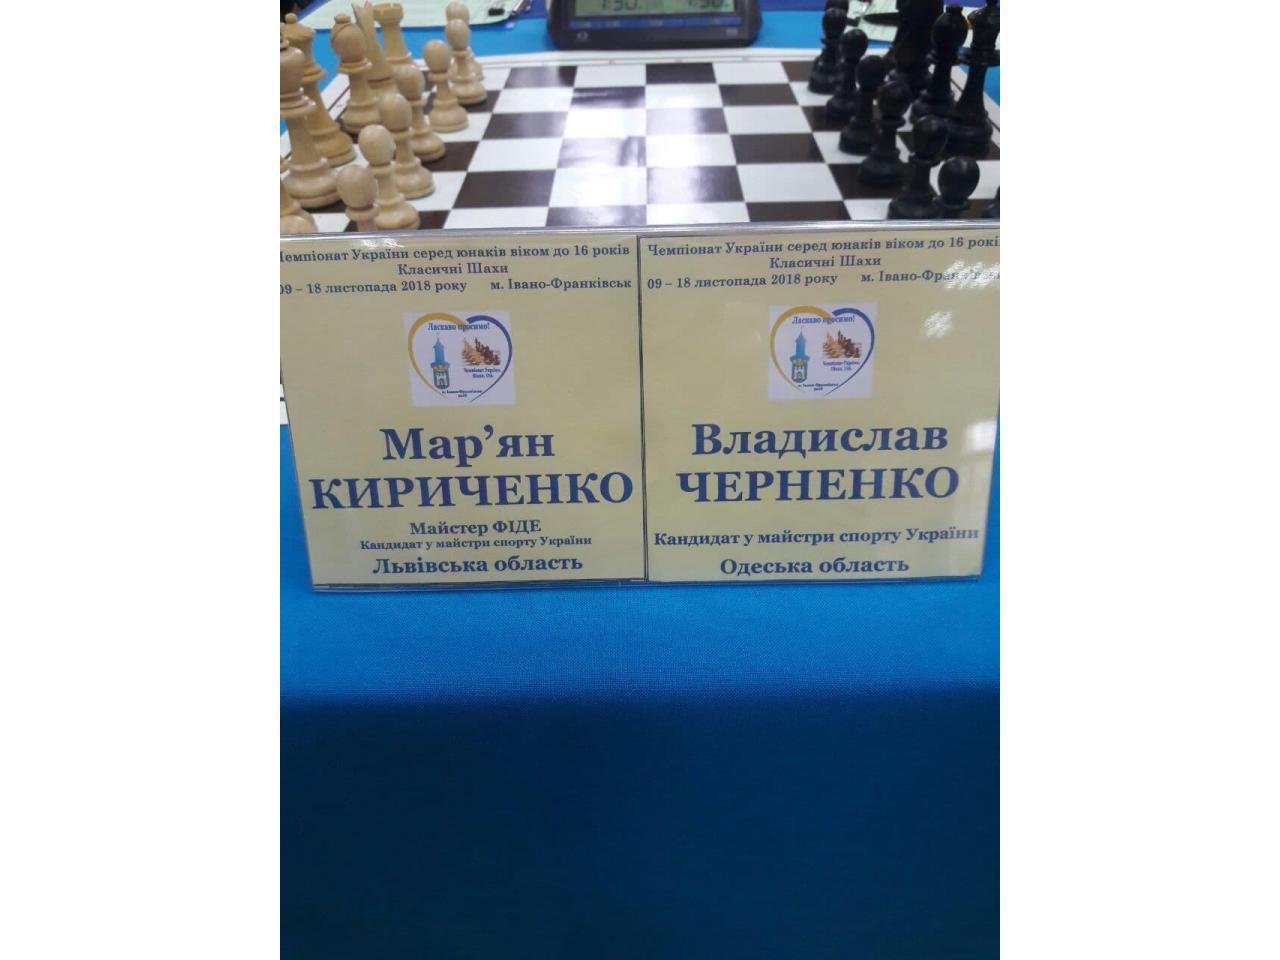 Тренер-репетитор по шахматам онлайн - 2